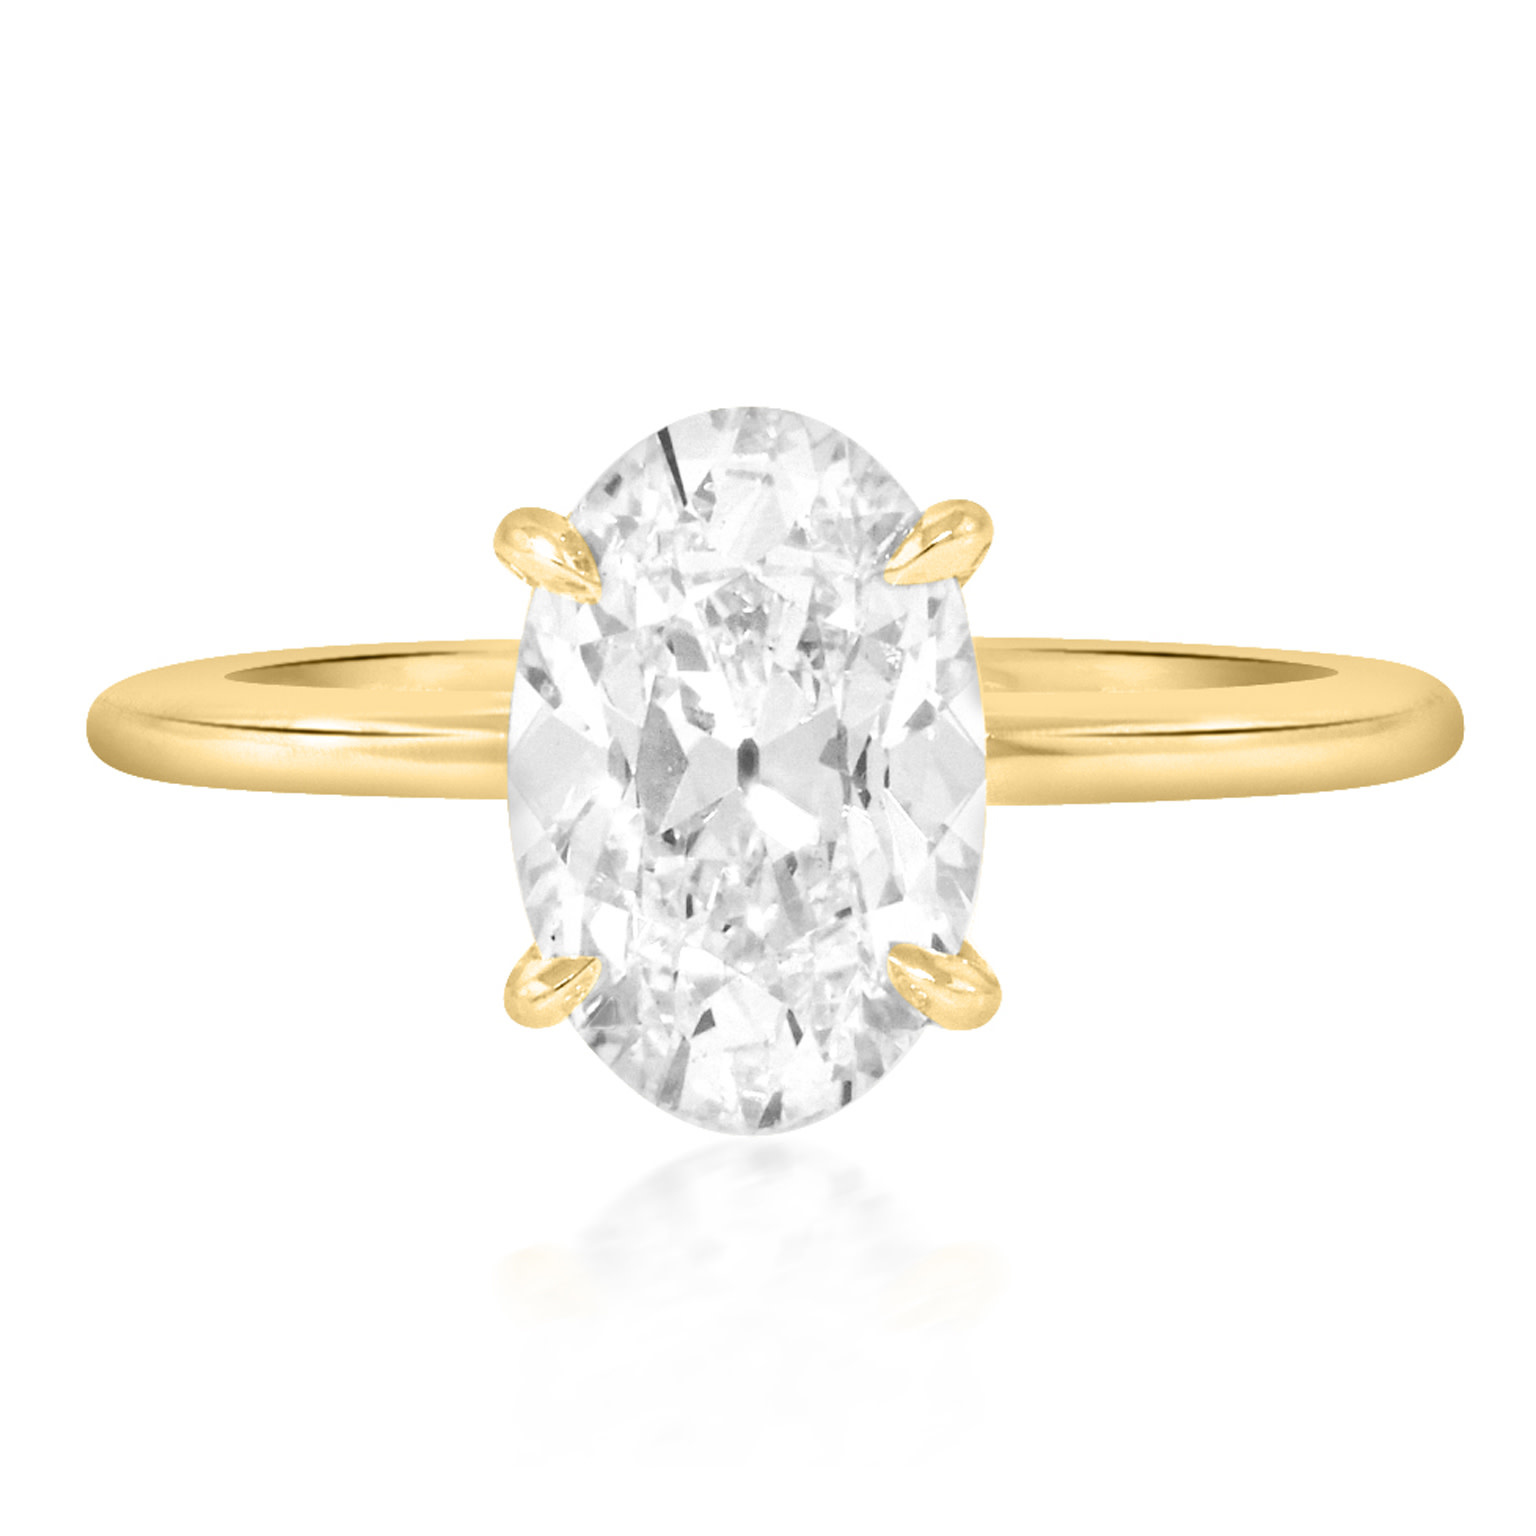 Trabert Goldsmiths 2.02ct FVS1 Antique Oval Lab Diamond Aura Ring